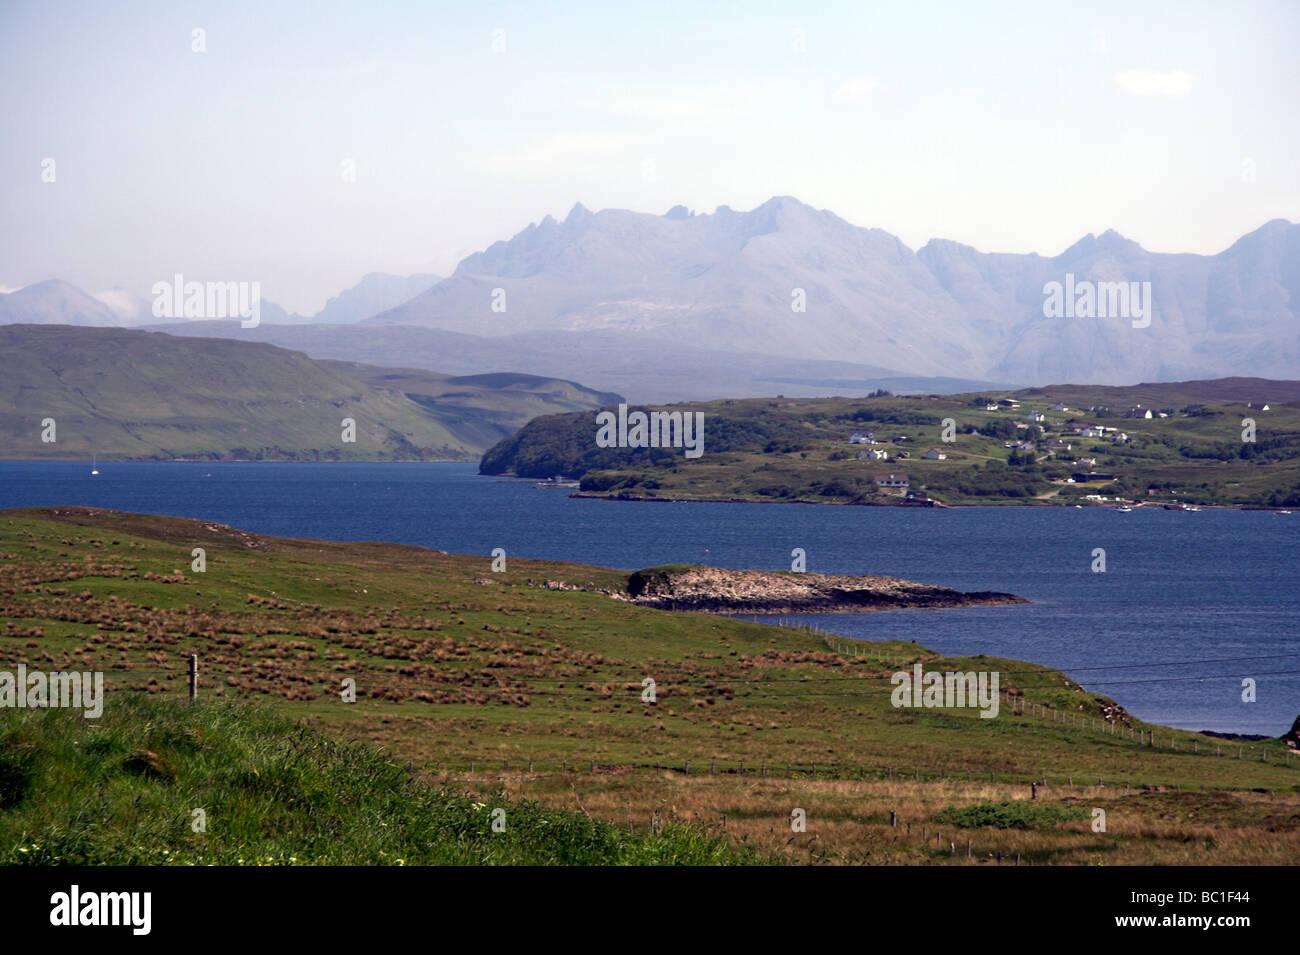 Cuillin Hills, Loch Harport, Isle of Skye, Inner Hebrides, West Coast of Scotland, UK Stock Photo